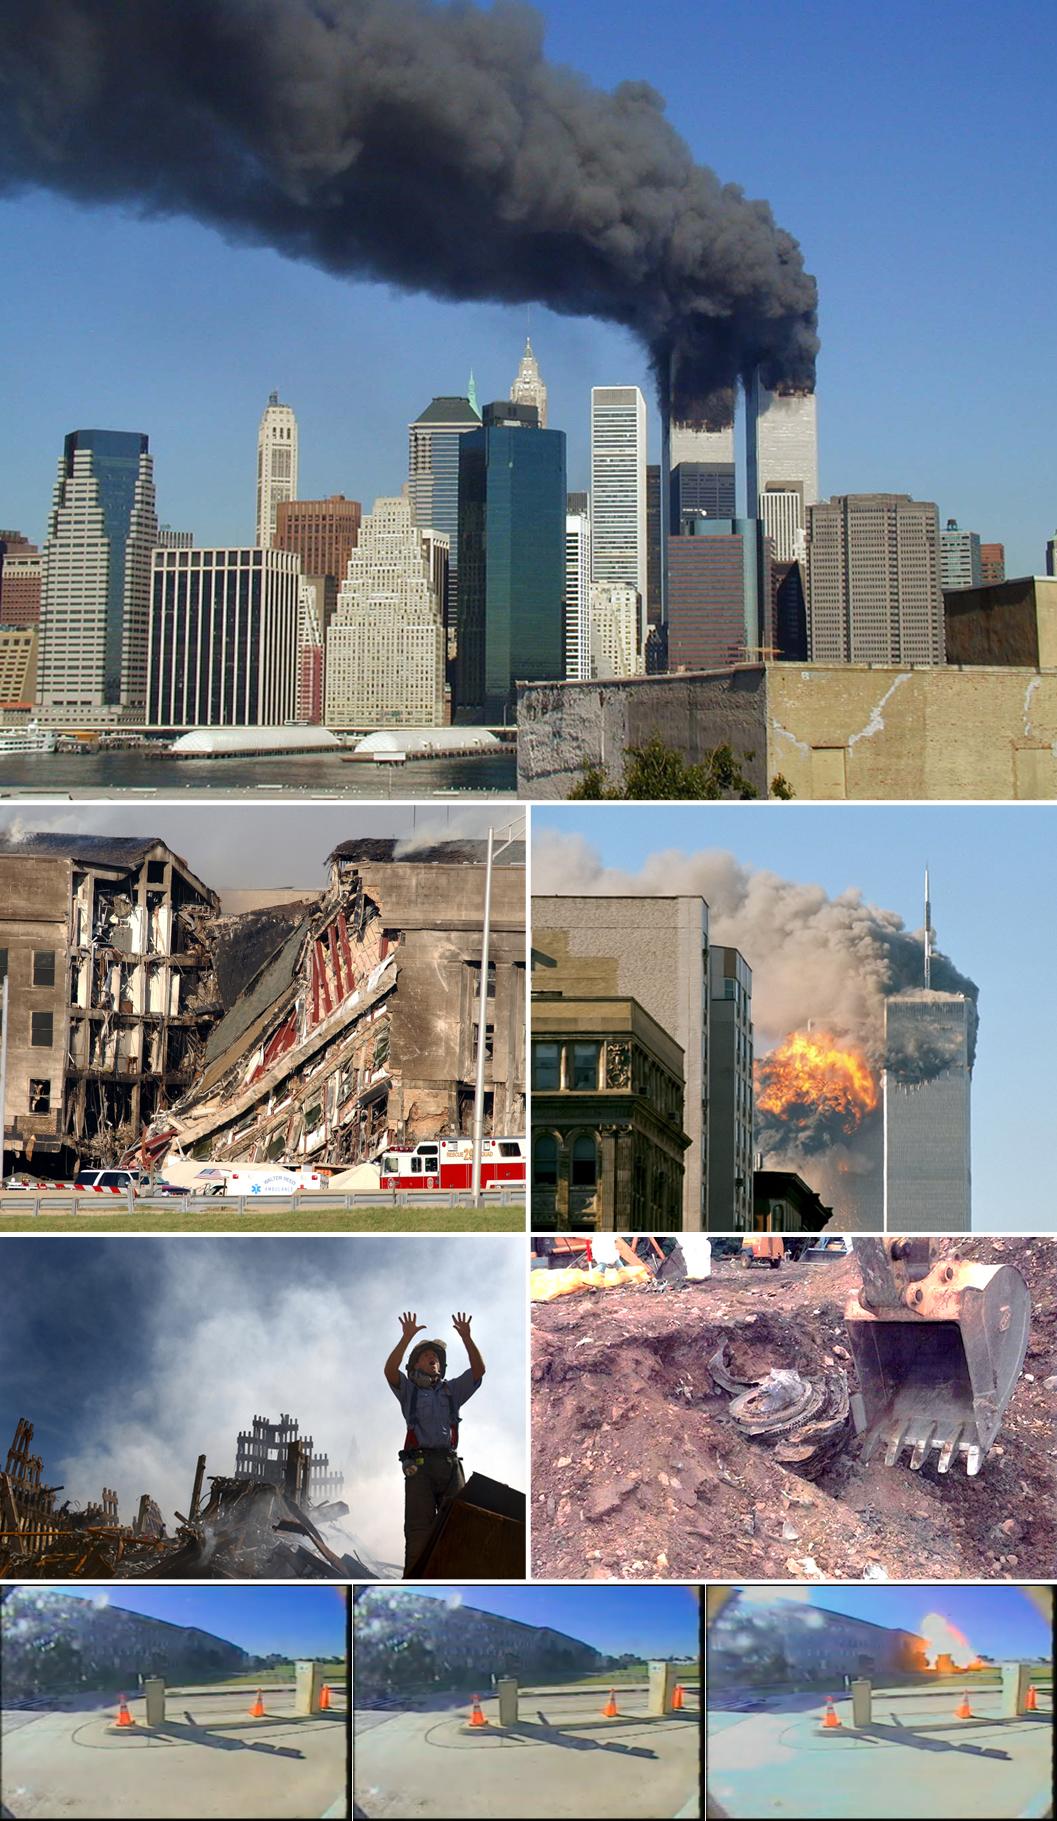 911 montage